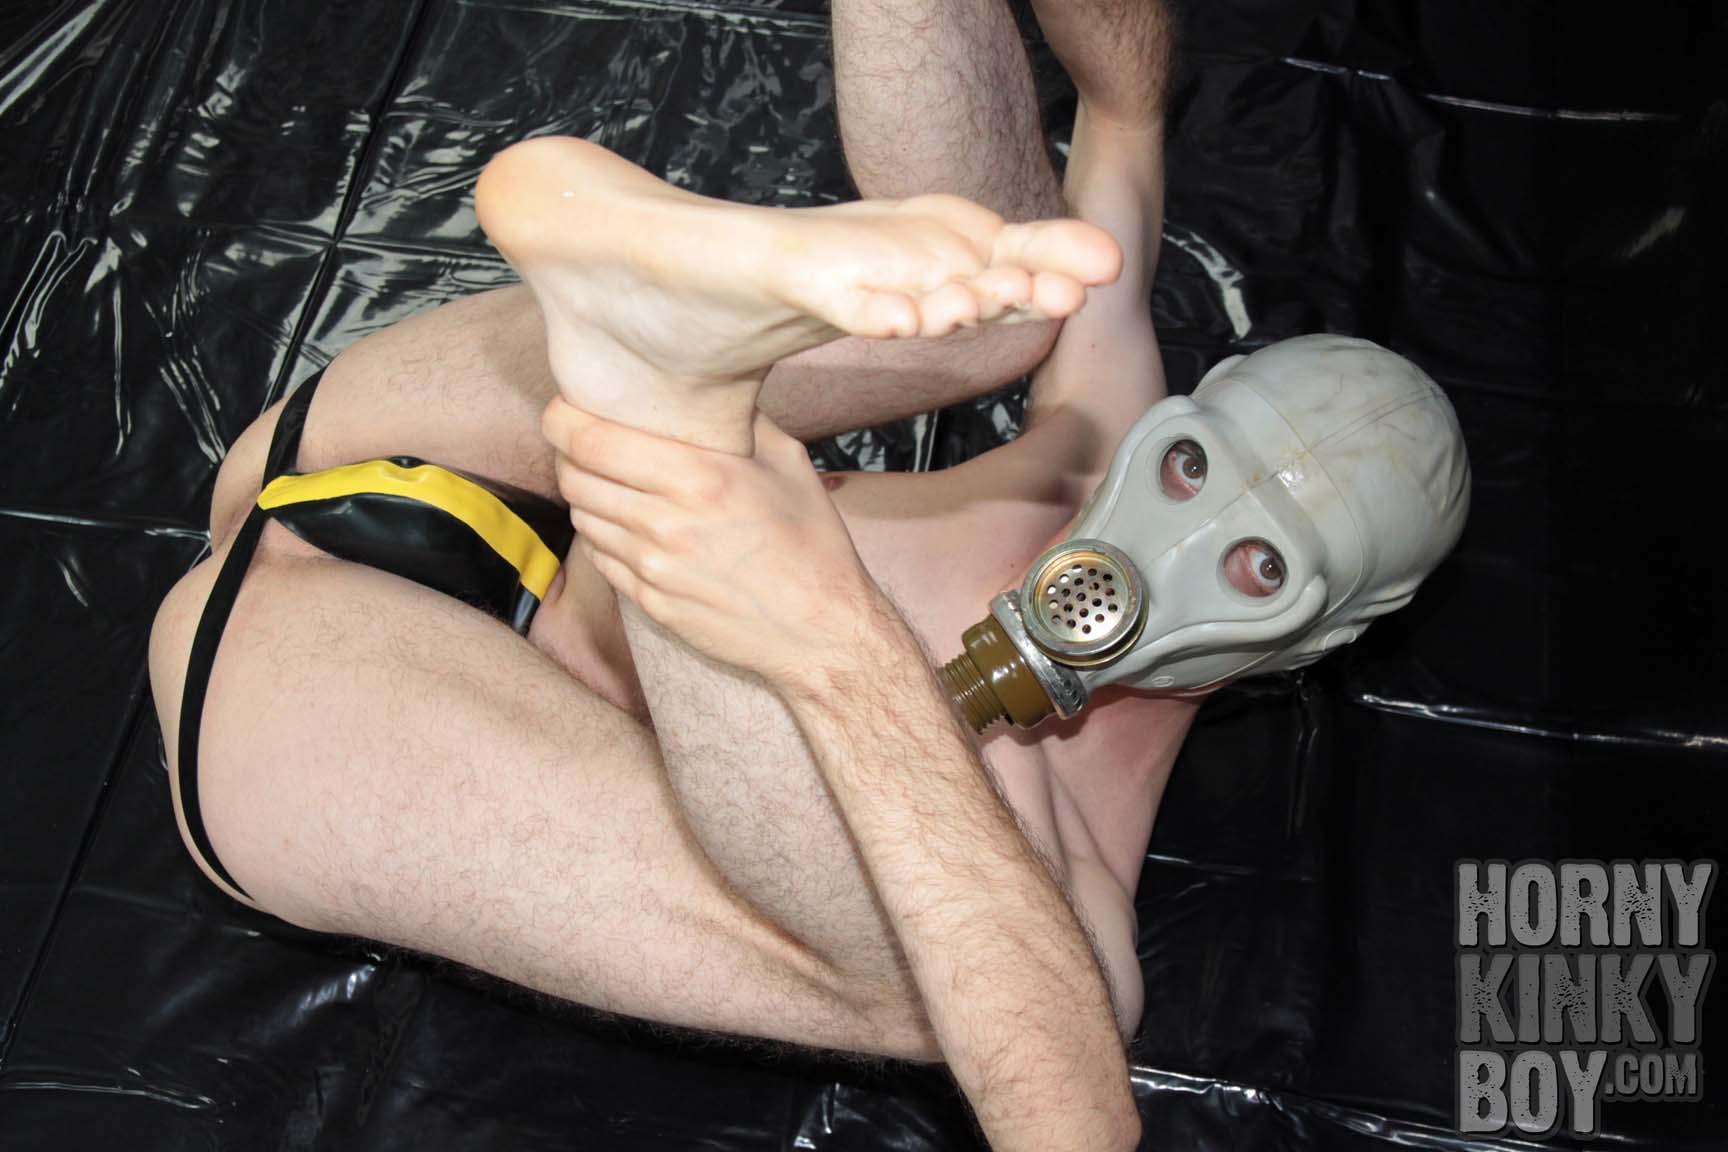 Few Shots Of A Guy Wearing A Grey Monkey Gas Mask